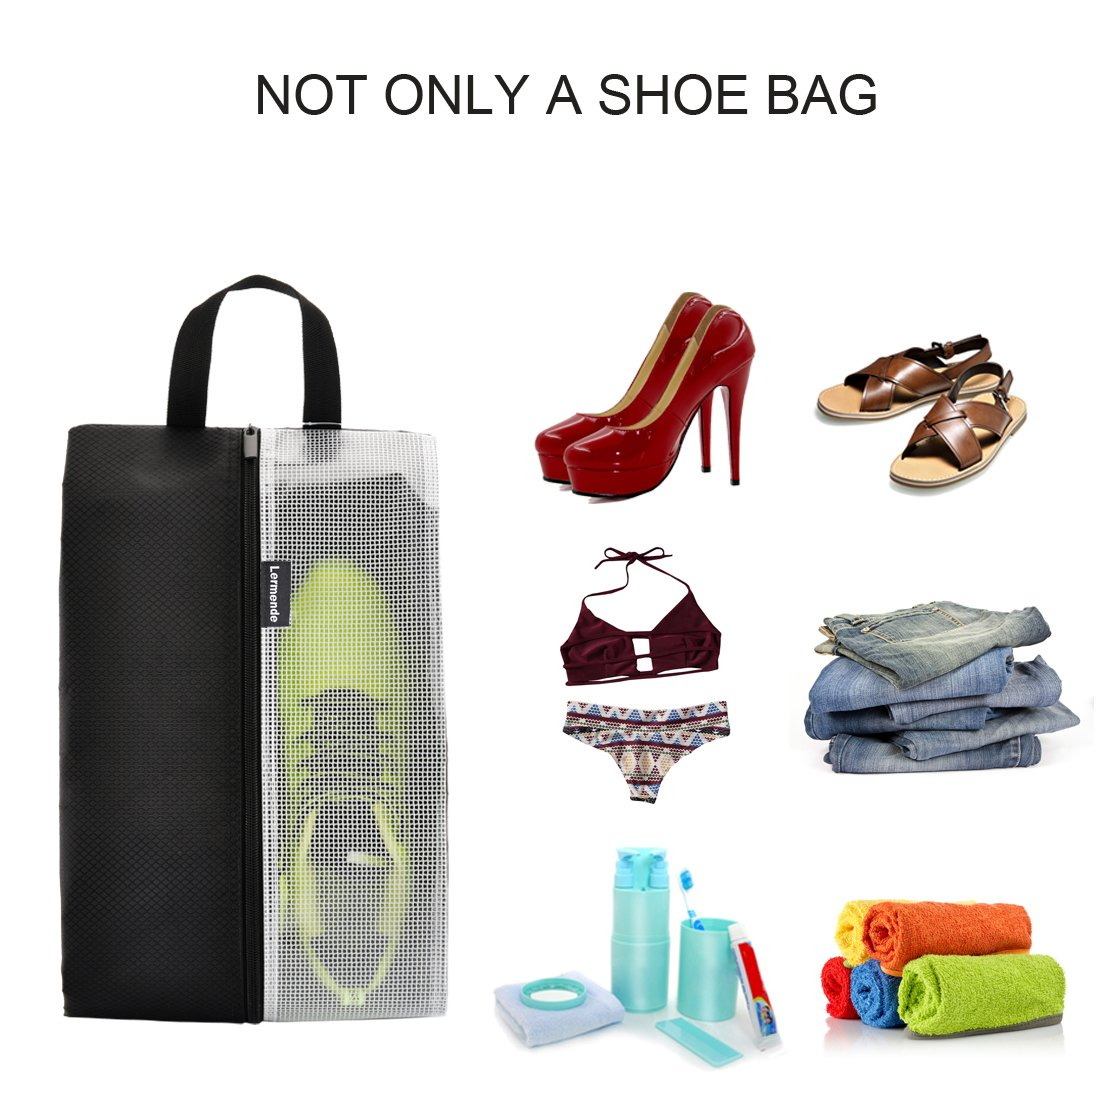 Lermende Travel Shoe Bags Waterproof Nylon Organizer Storage Tote Pouch 5pcs by Lermende (Image #4)